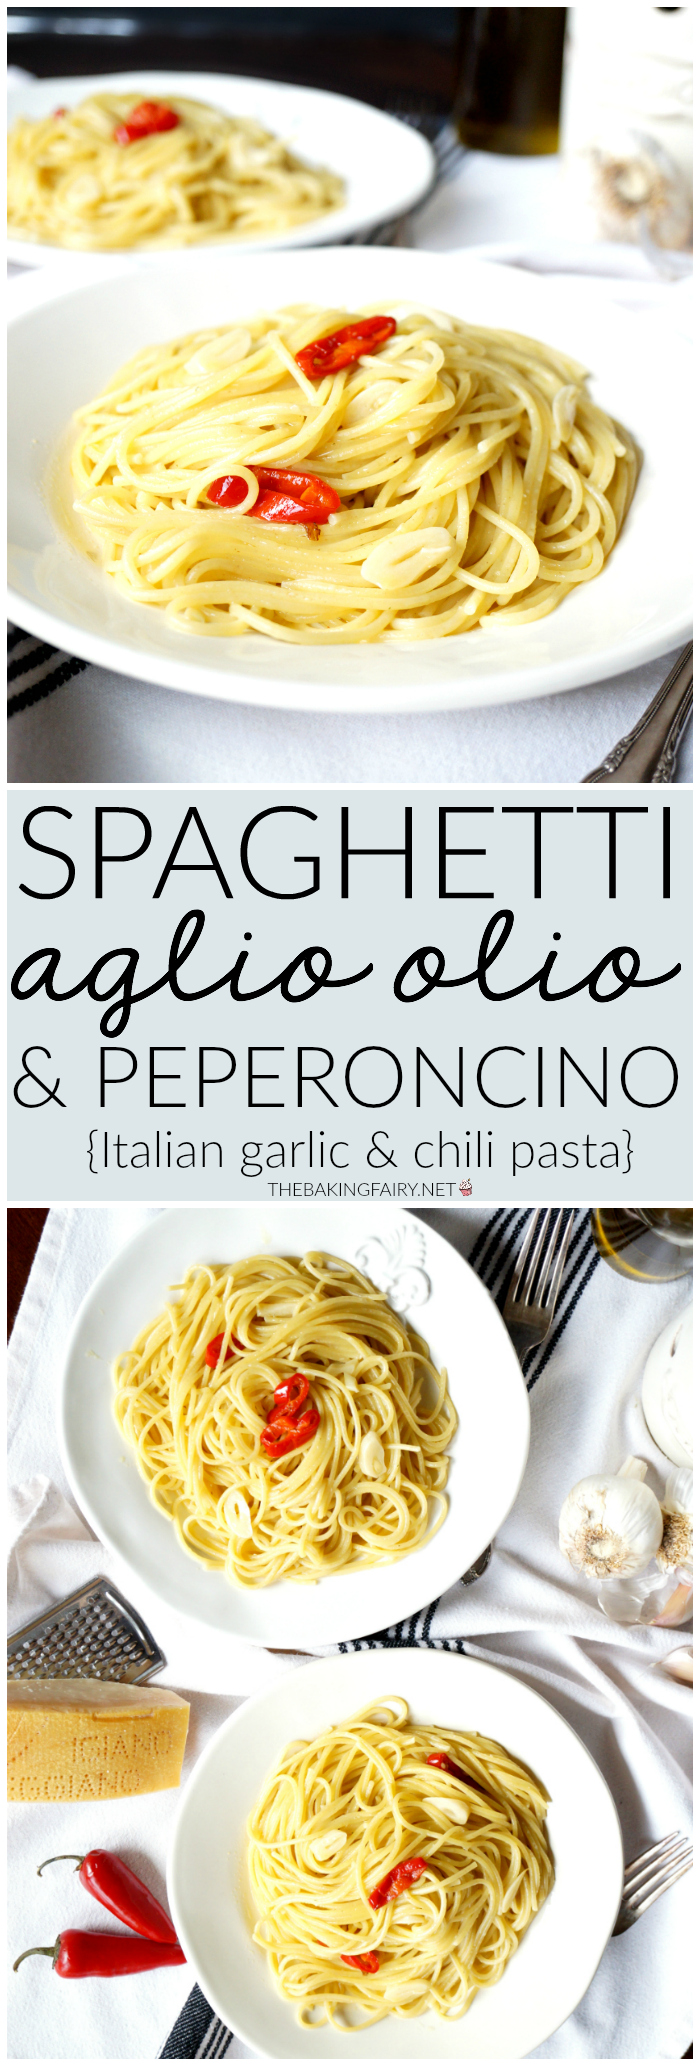 spaghetti aglio, olio & peperoncino | The Baking Fairy